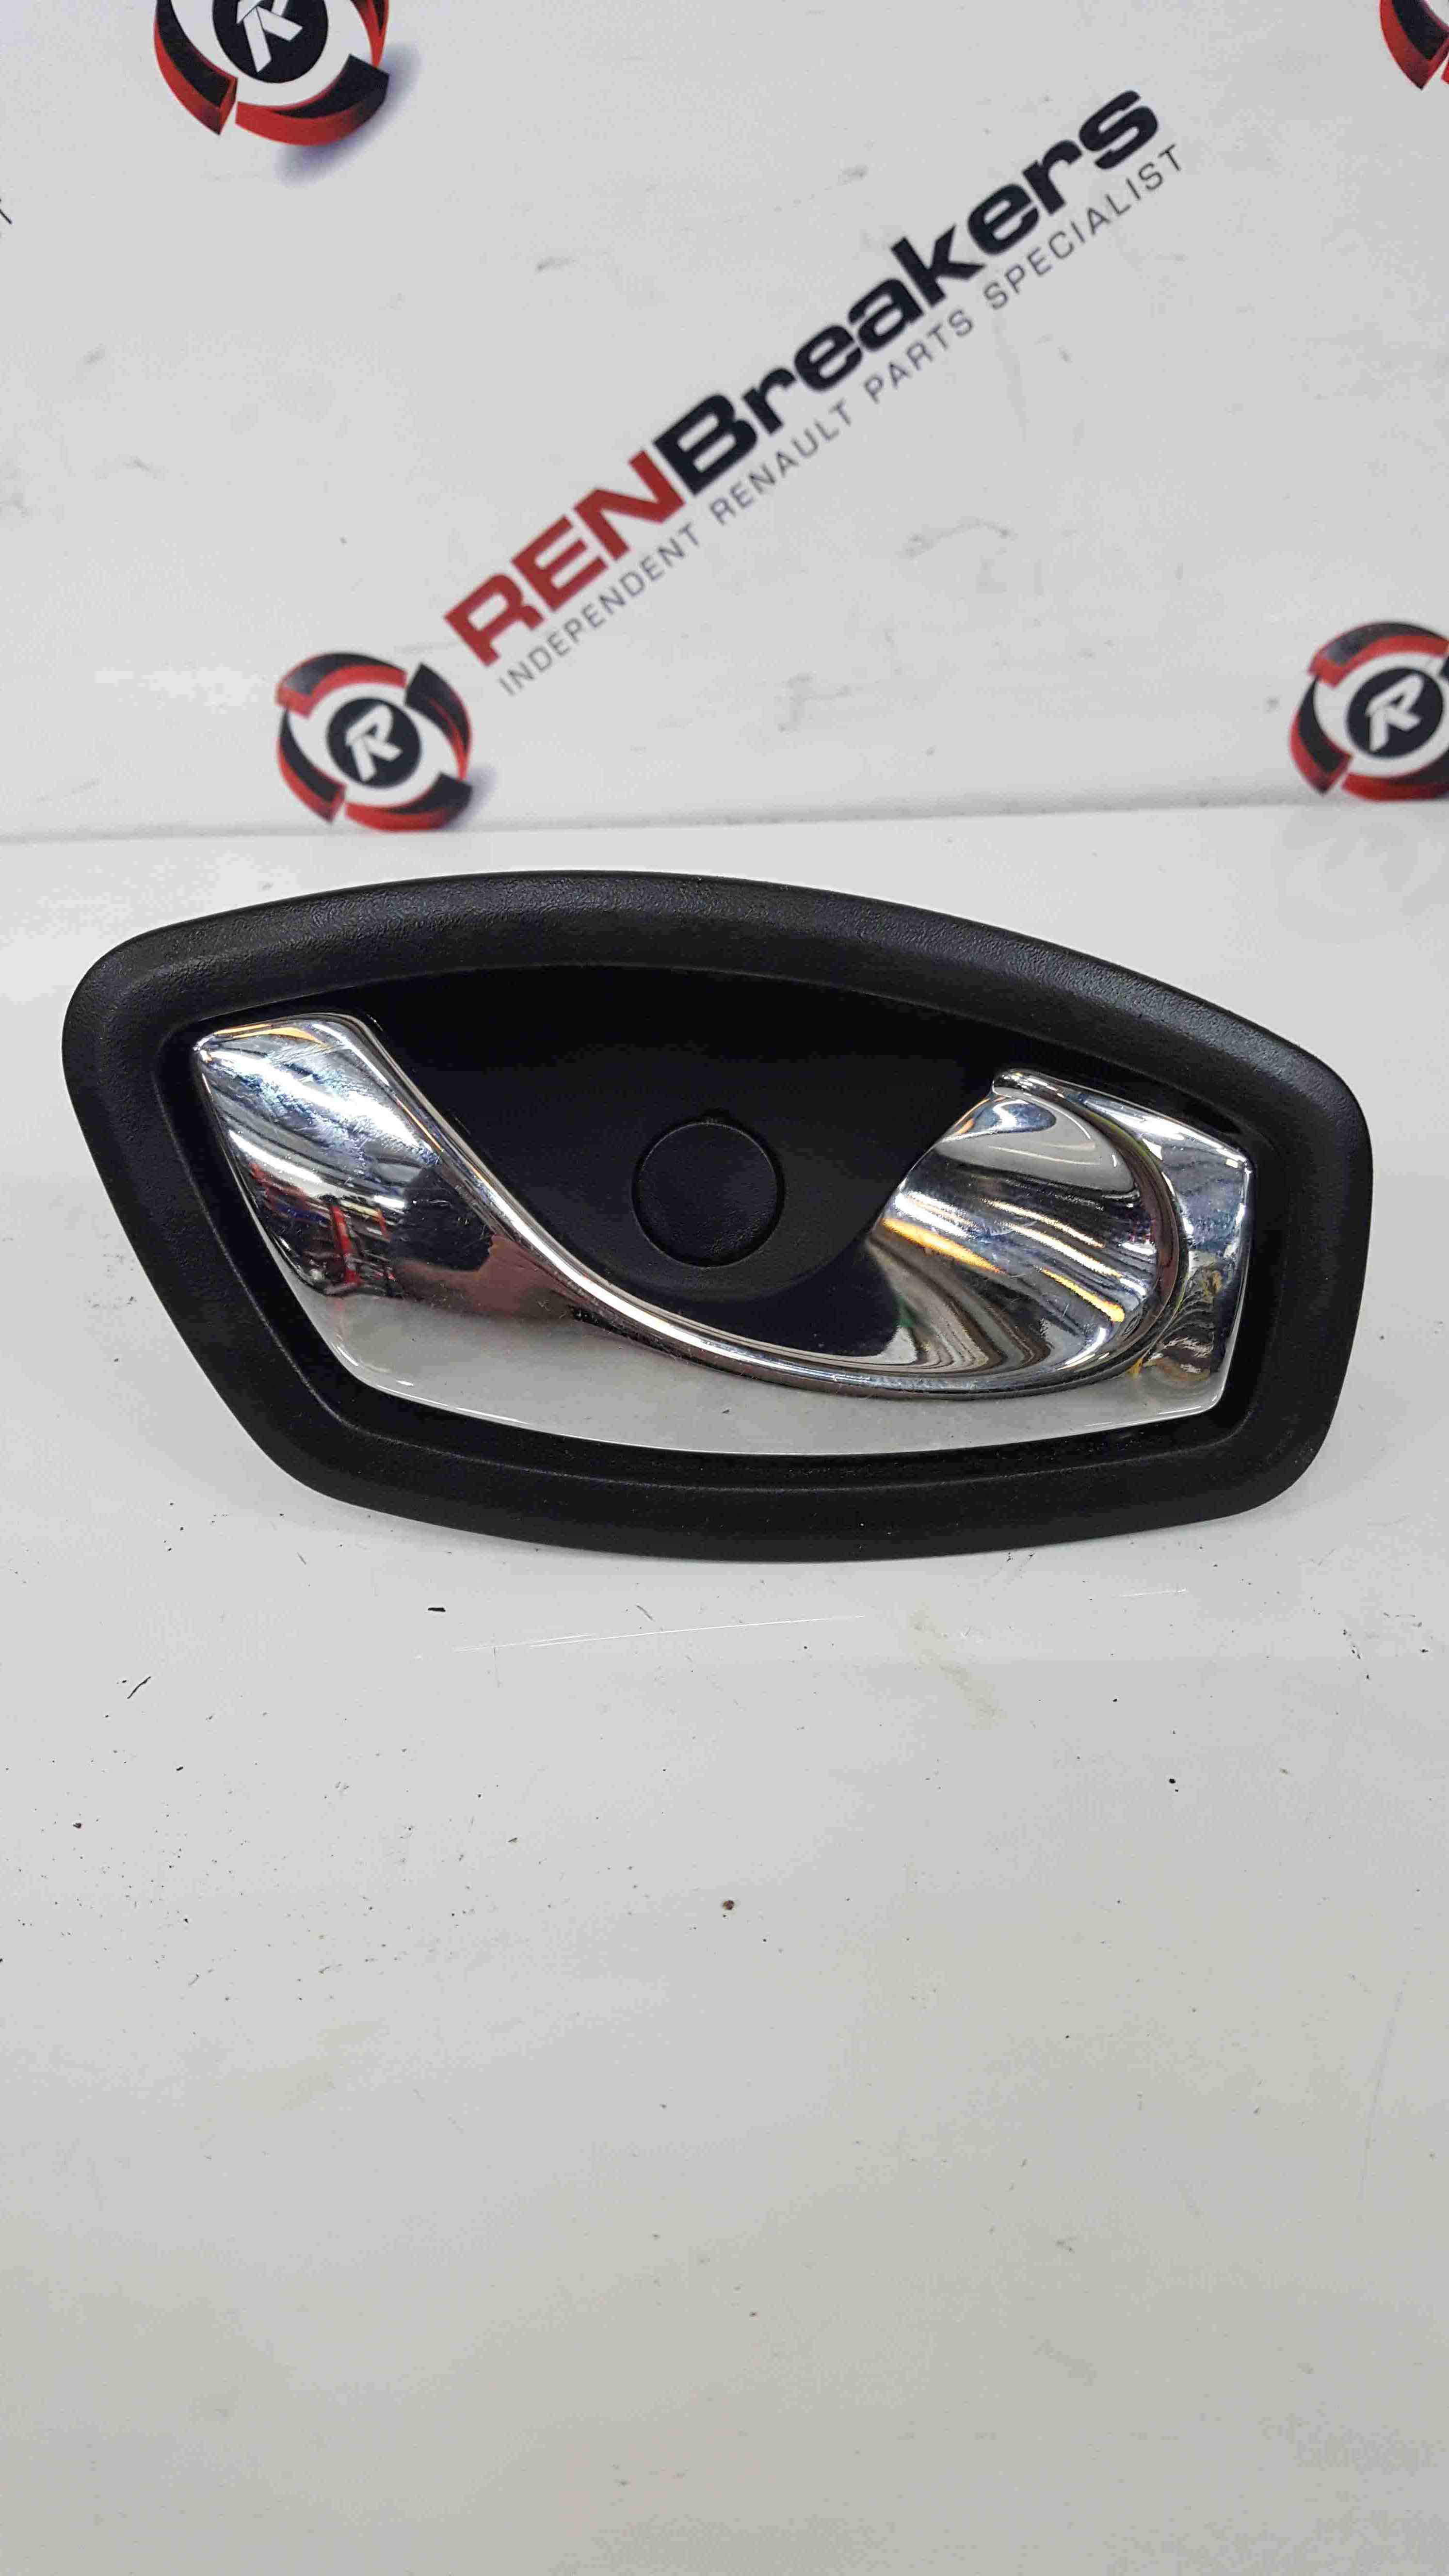 Renault Grand Scenic MK3 2009-2016 Drivers OSR Rear Interior Door Handle Chrome